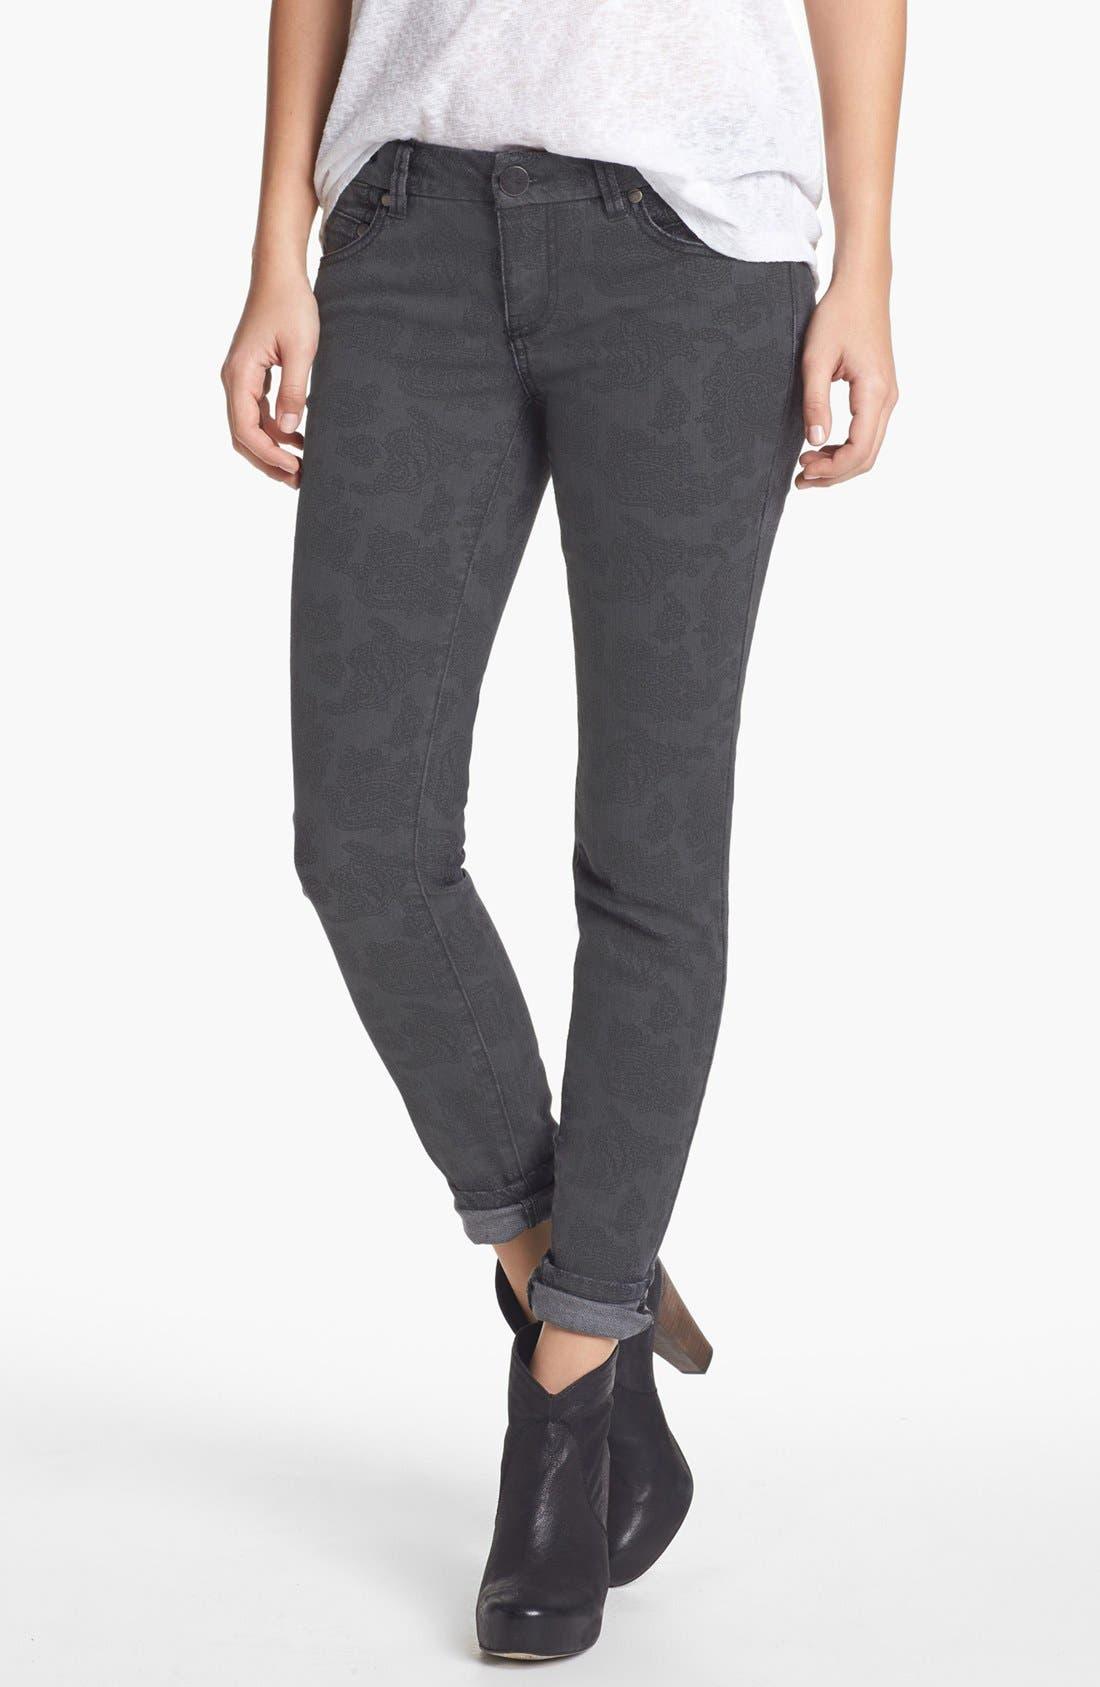 Alternate Image 1 Selected - Fire Paisley Print Skinny Jeans (Charcoal) (Juniors)